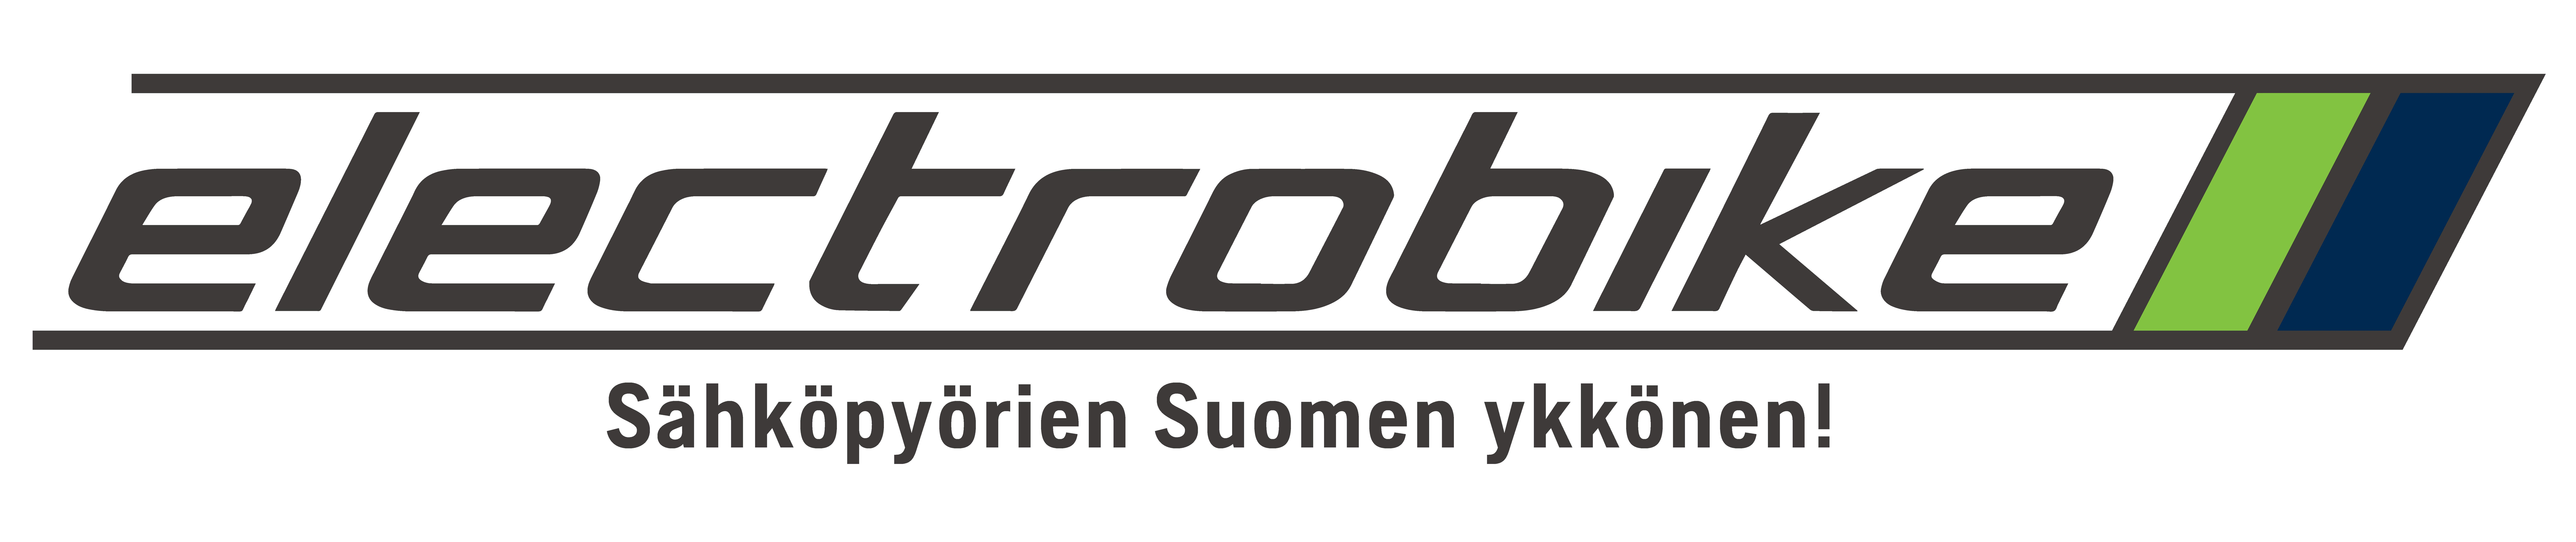 Electrobike / Scanfour Oy logo